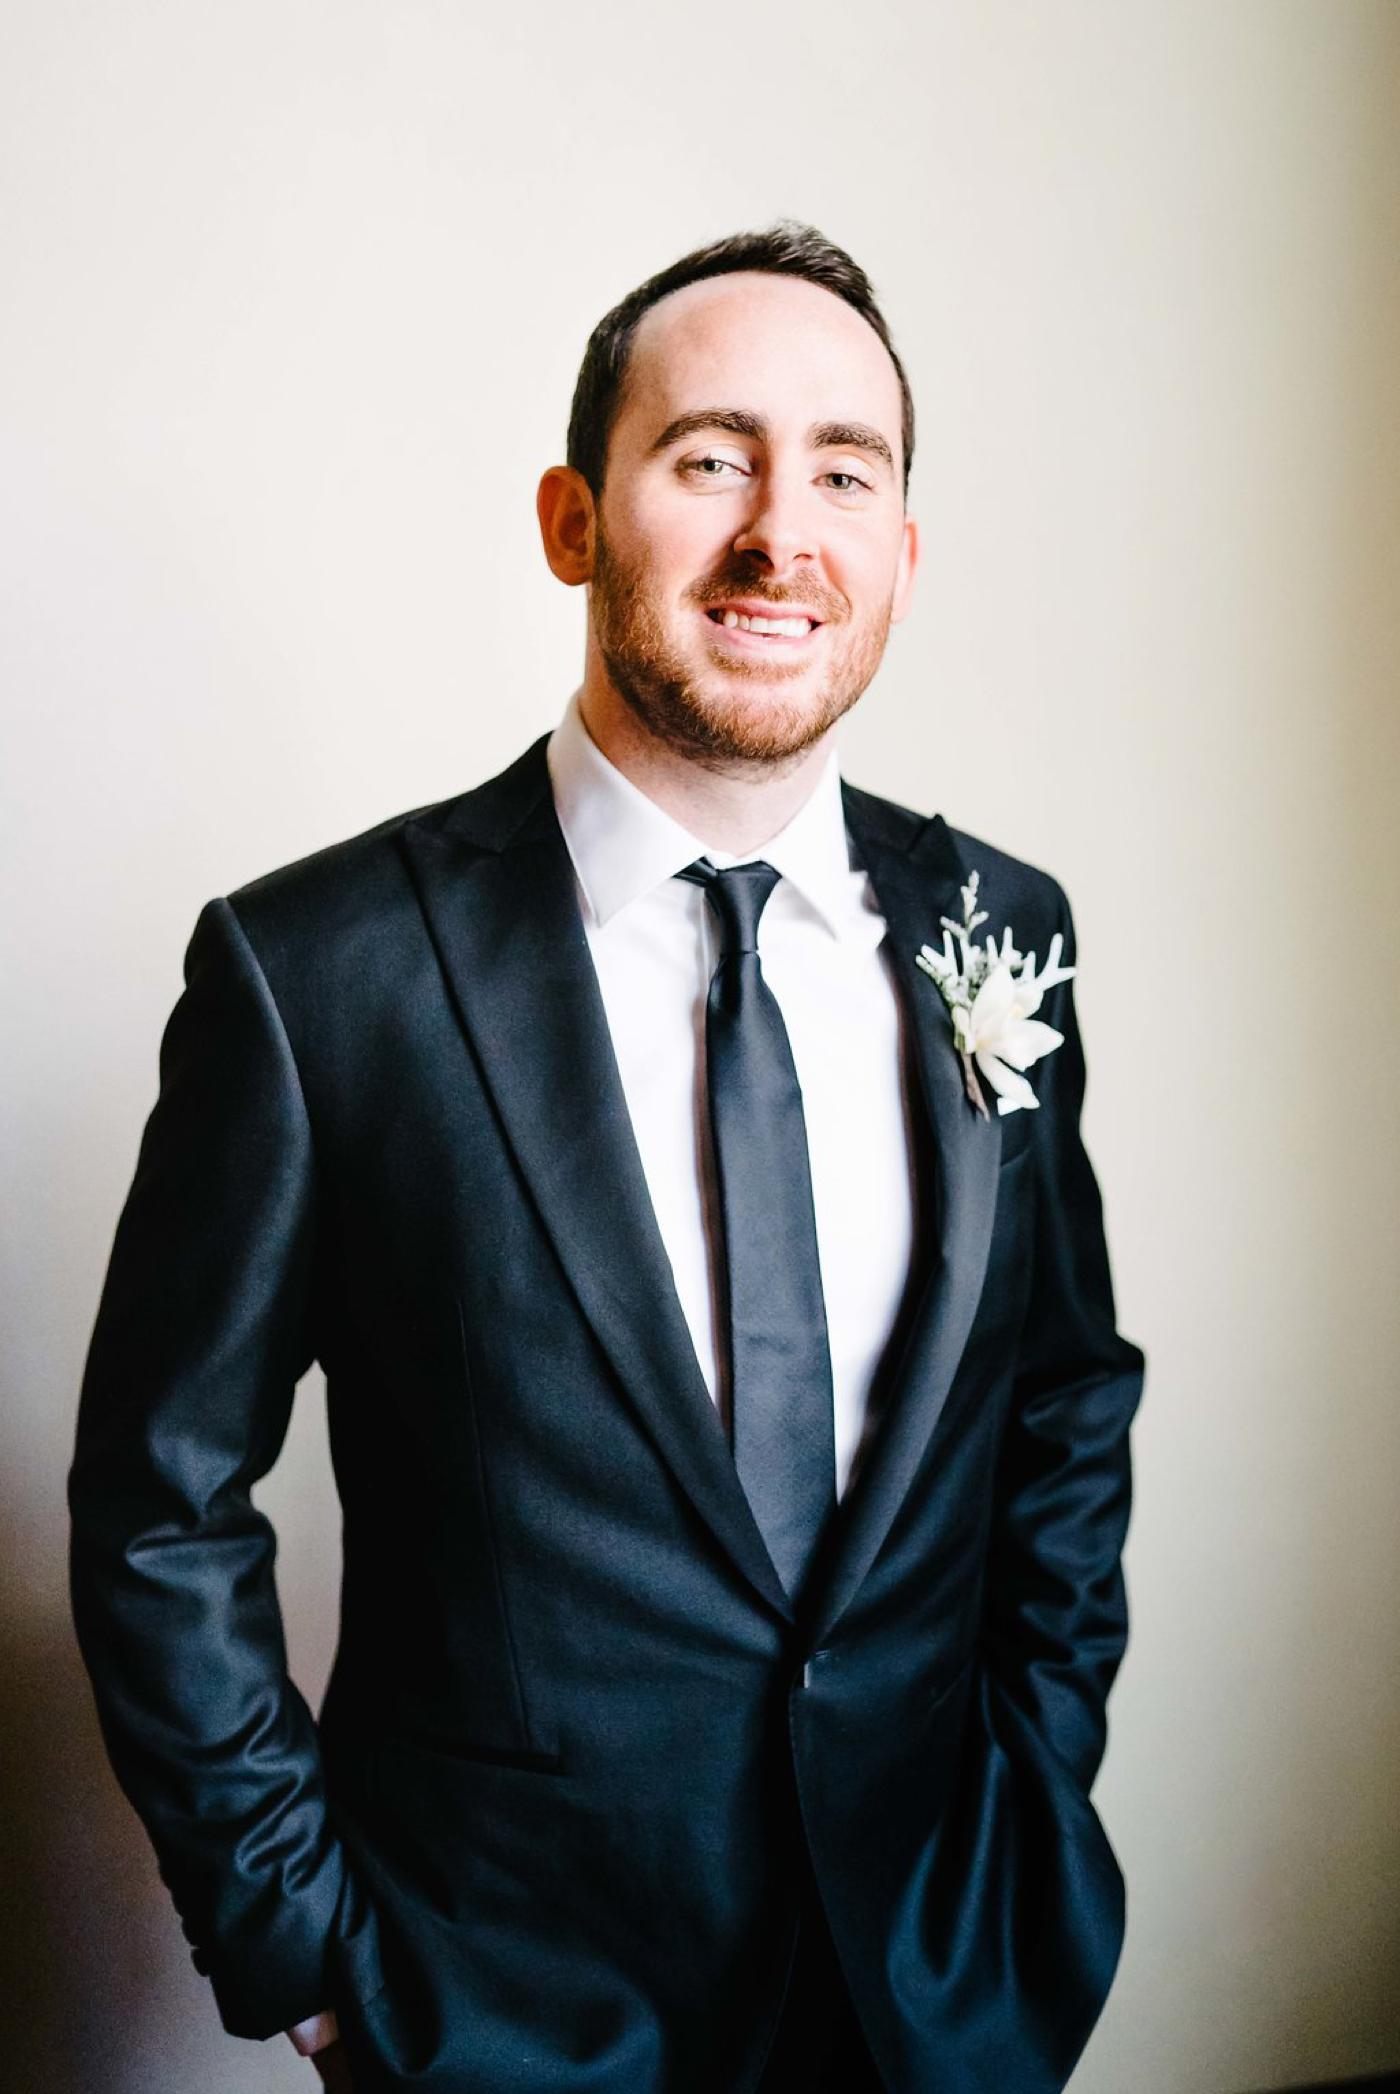 chicago-fine-art-wedding-photography-duncan19